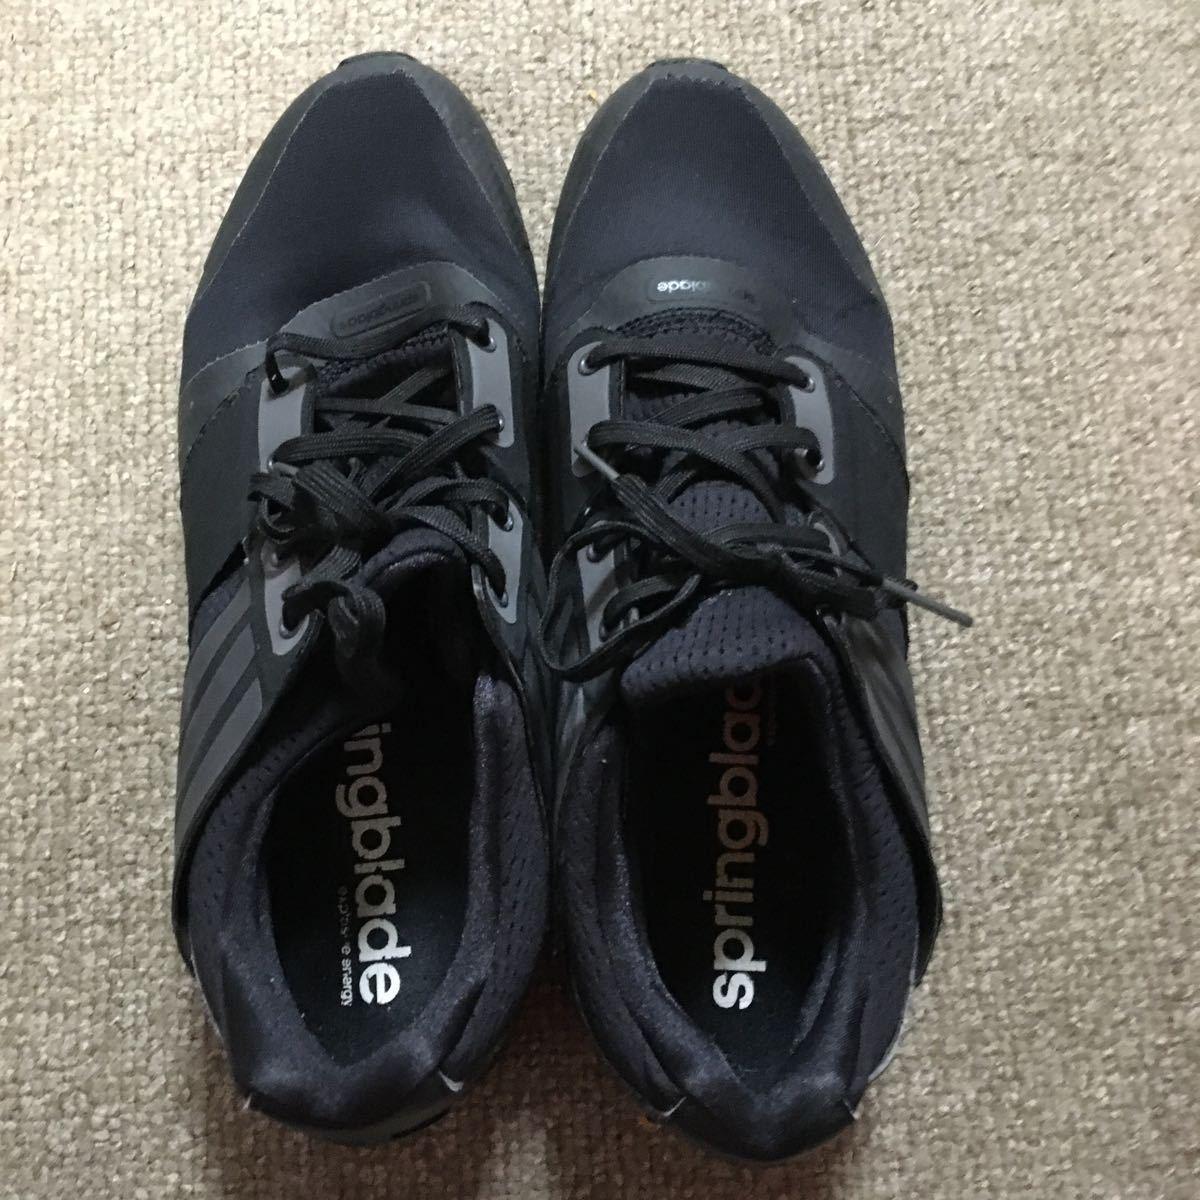 Adidas springs лезвие adidas springblade черный / серый 28.0